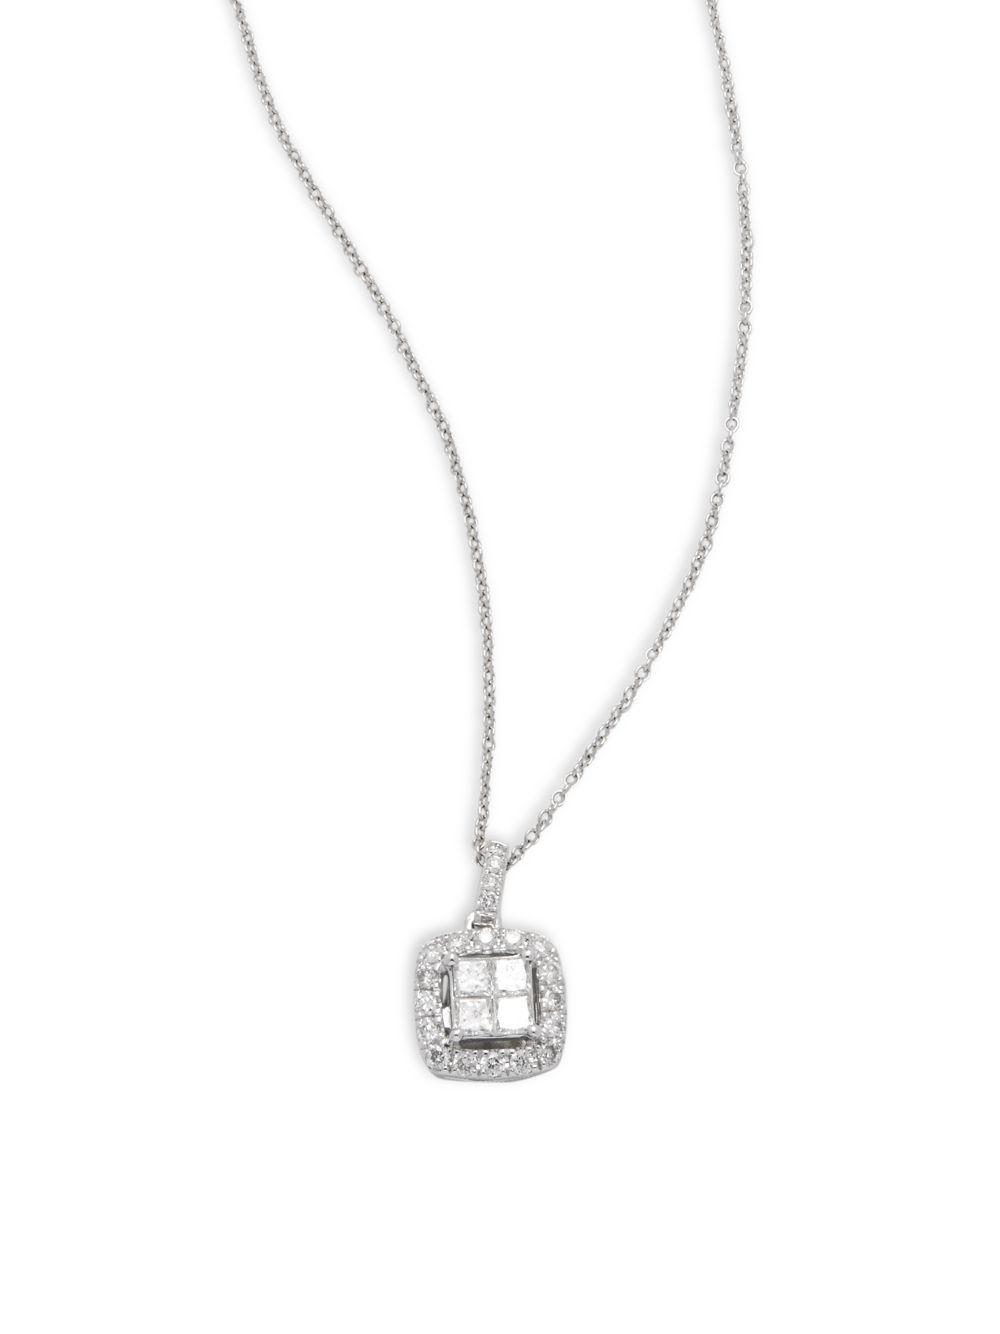 14k White Gold Square Pendant Necklace